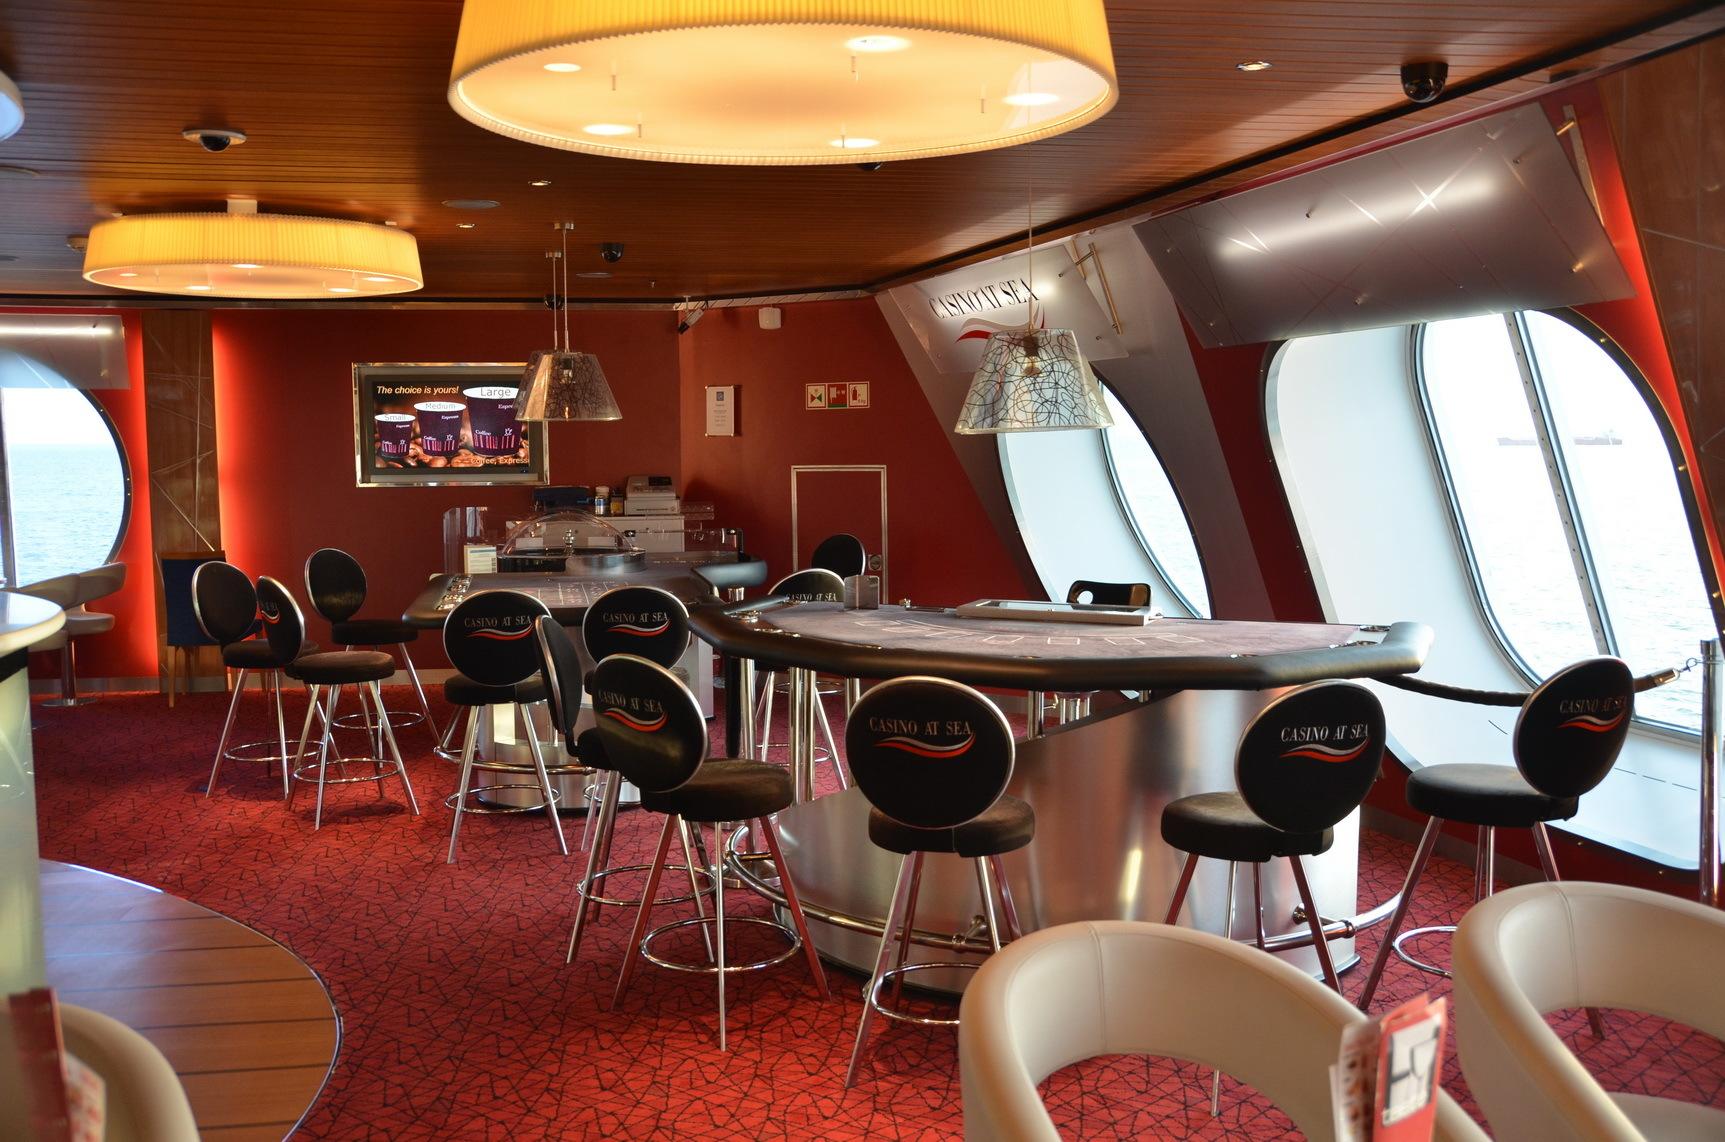 Stena Hollandica_casino jpg - Stena Hollandica - Shipfriends